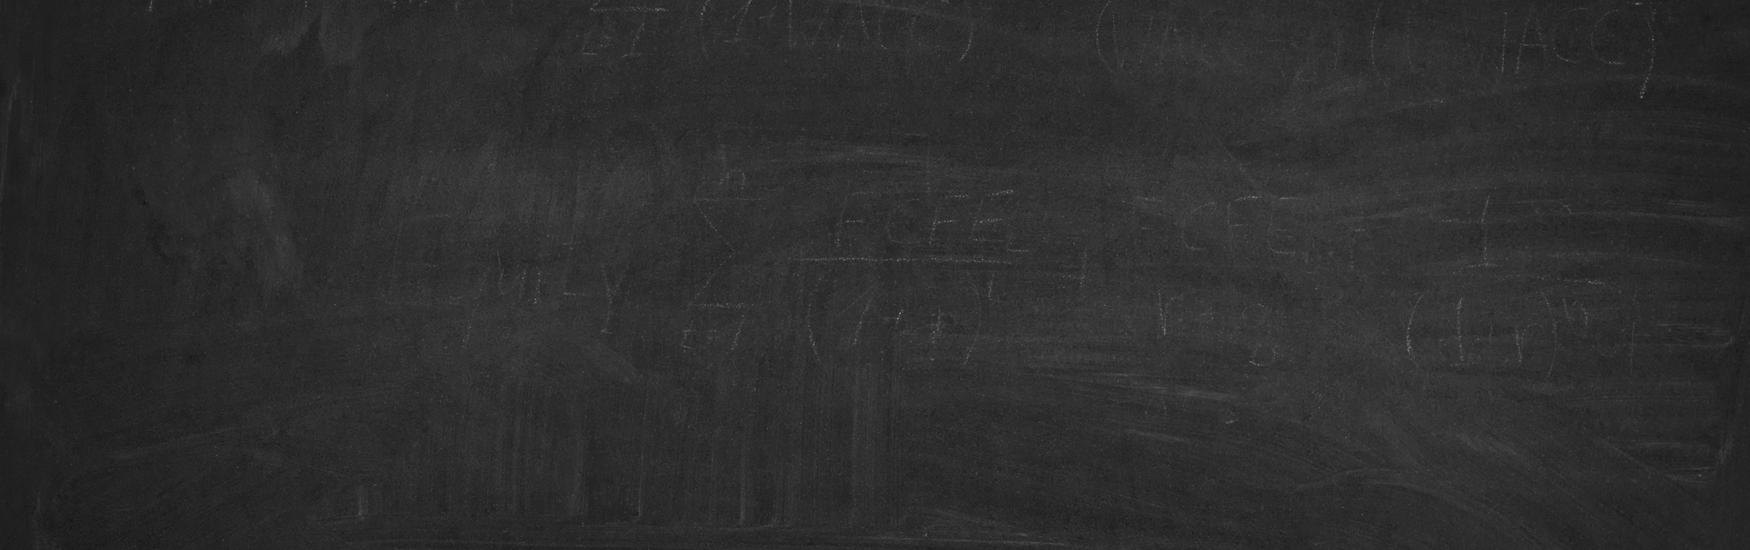 black blackboard